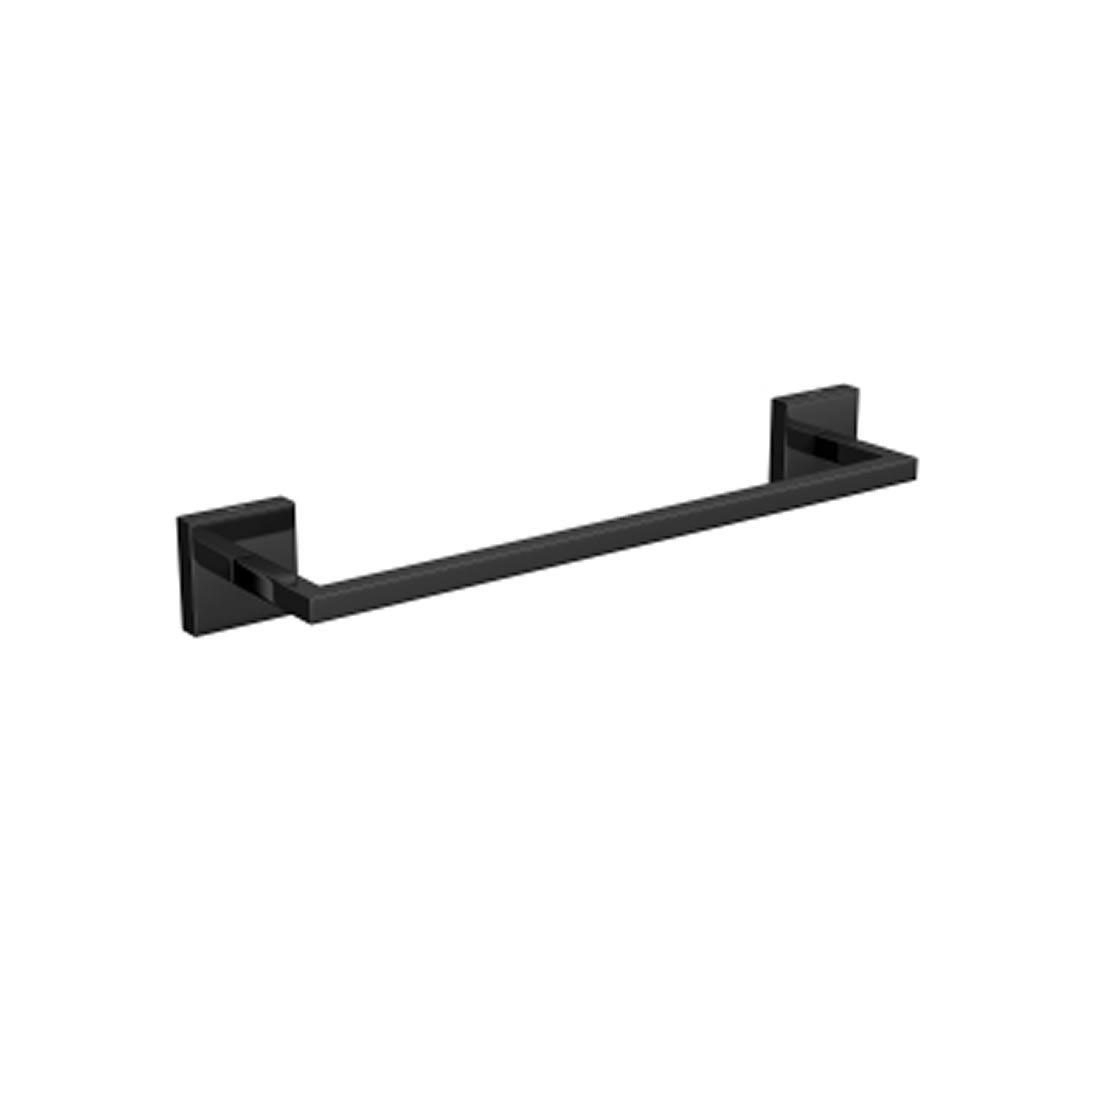 Porta Toalha Deca Clean 30 Cm Black Noir Ref 2040.BL.030.CLN.NO